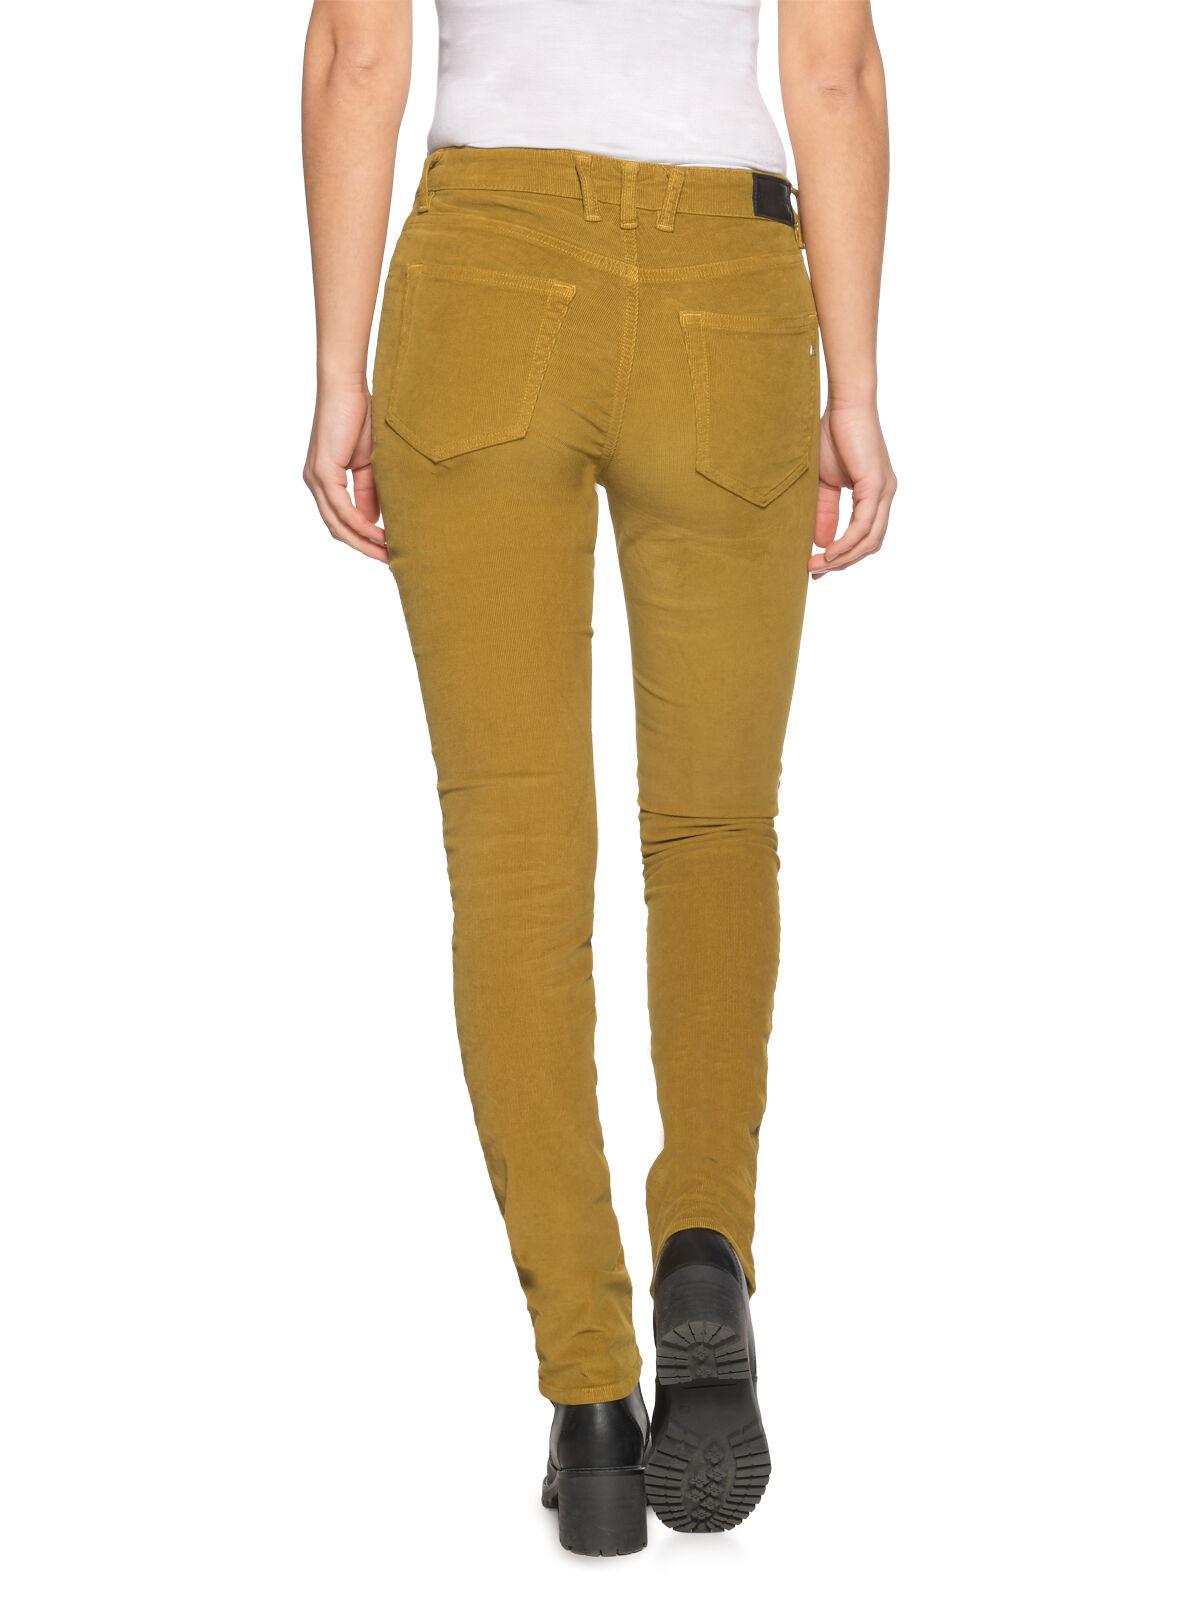 Katewin Corduroy Trousers